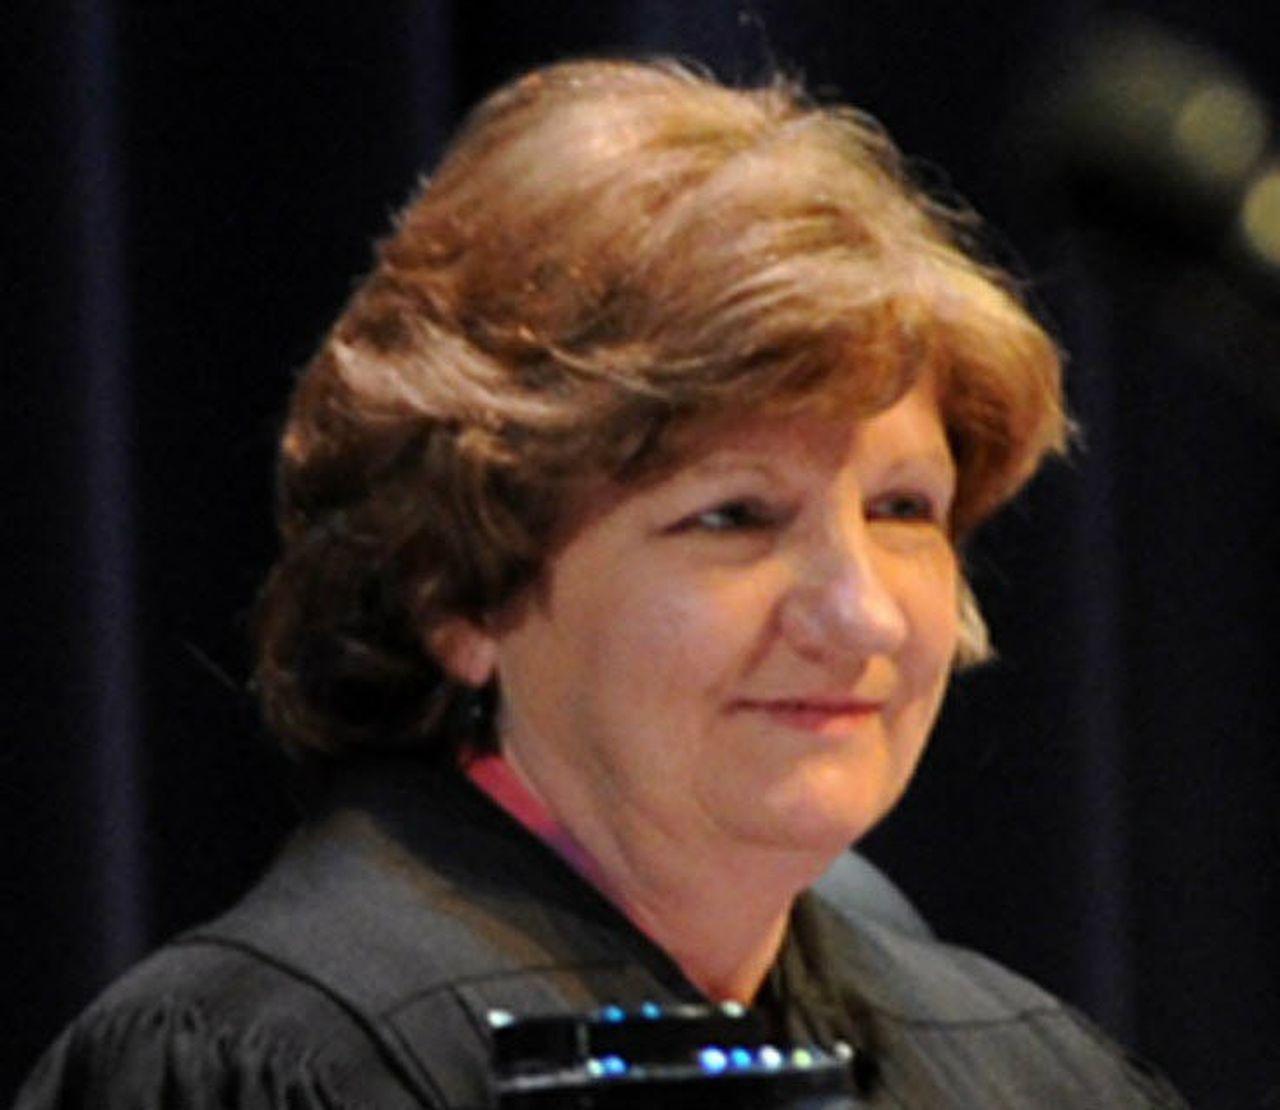 Judge, Clerk Warn Of Circuit Court Crisis In Mobile - Al regarding Lane County Circut Coirt Days